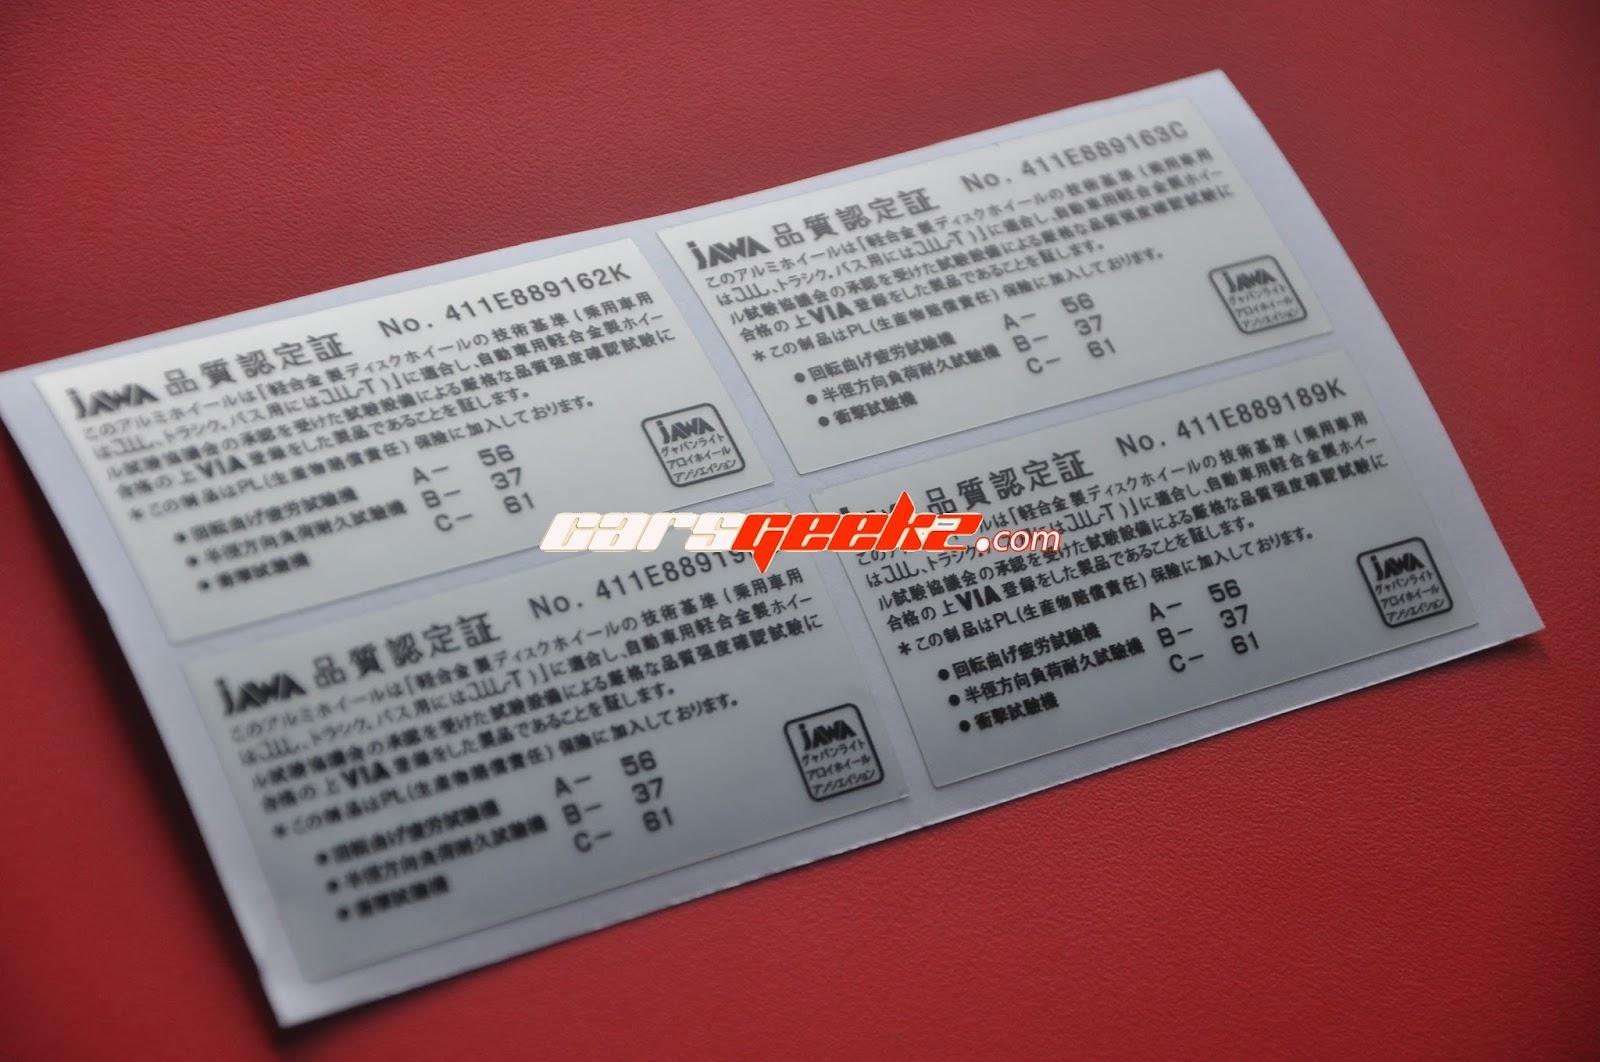 JAWA #2 Decals Sticker Fit For Volk Rays